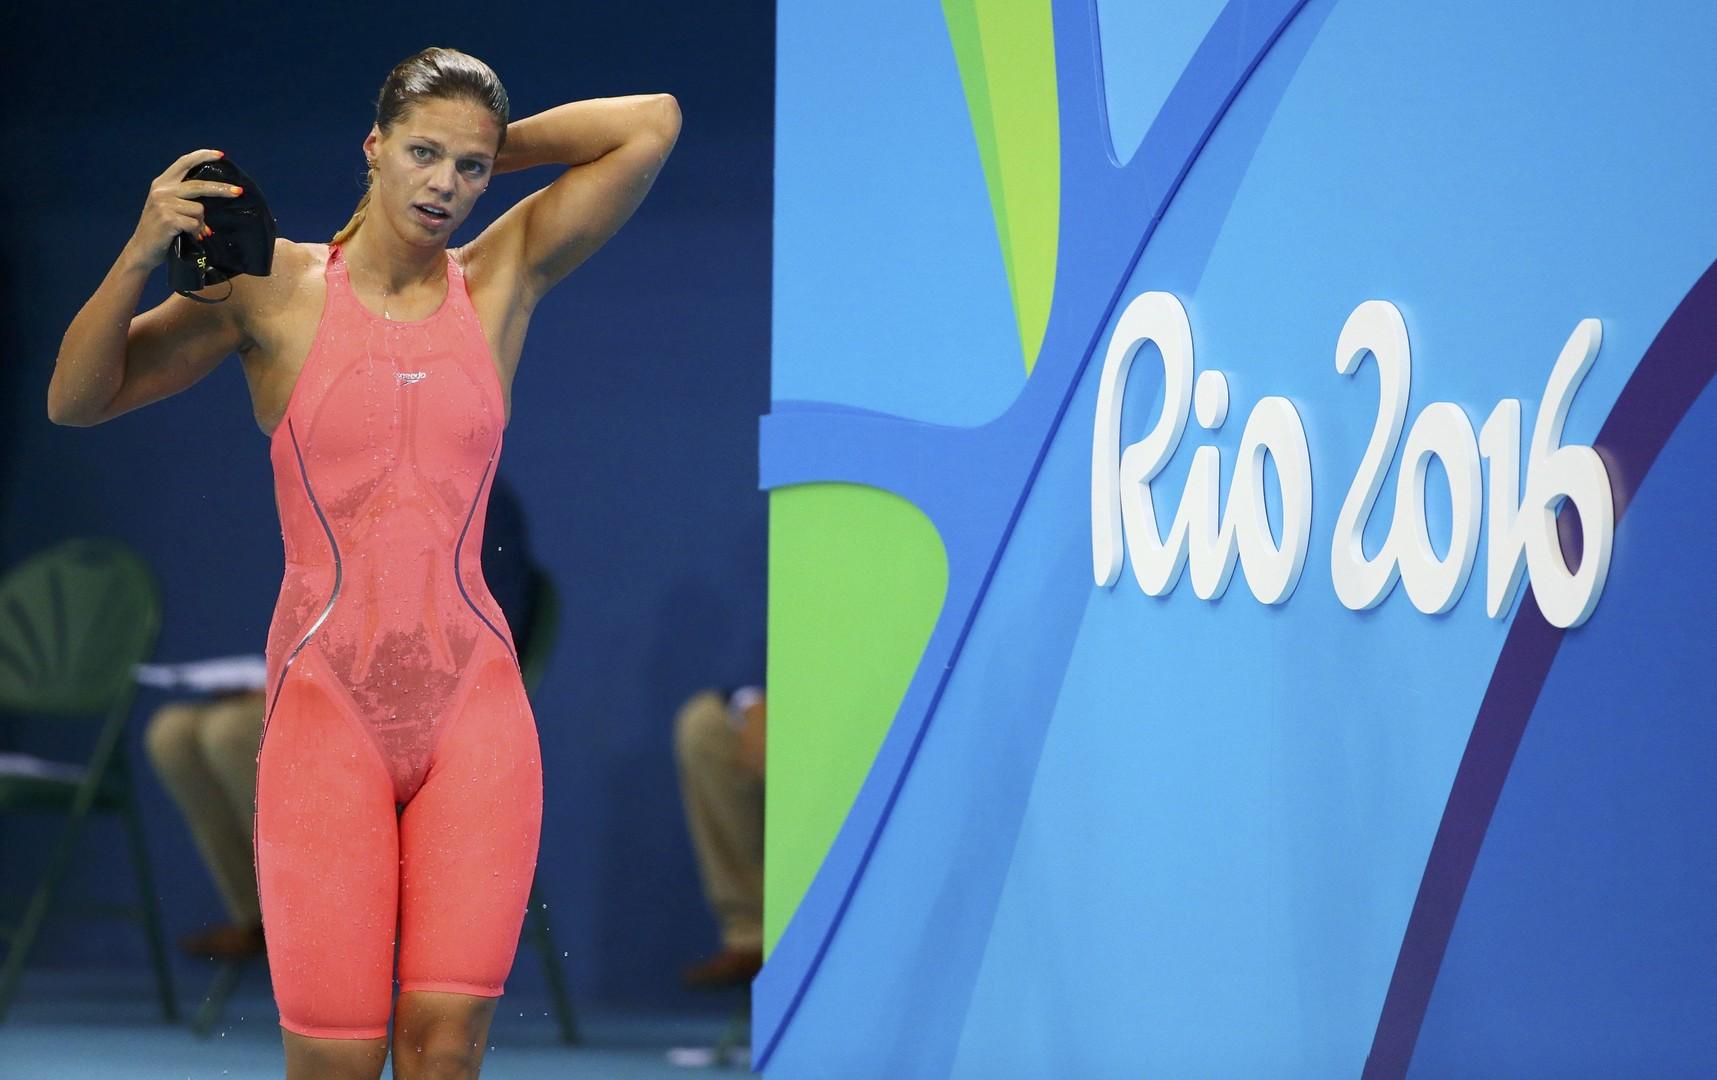 Пловчиха Юлия Ефимова завоевала серебряную медаль на Олимпиаде в Рио